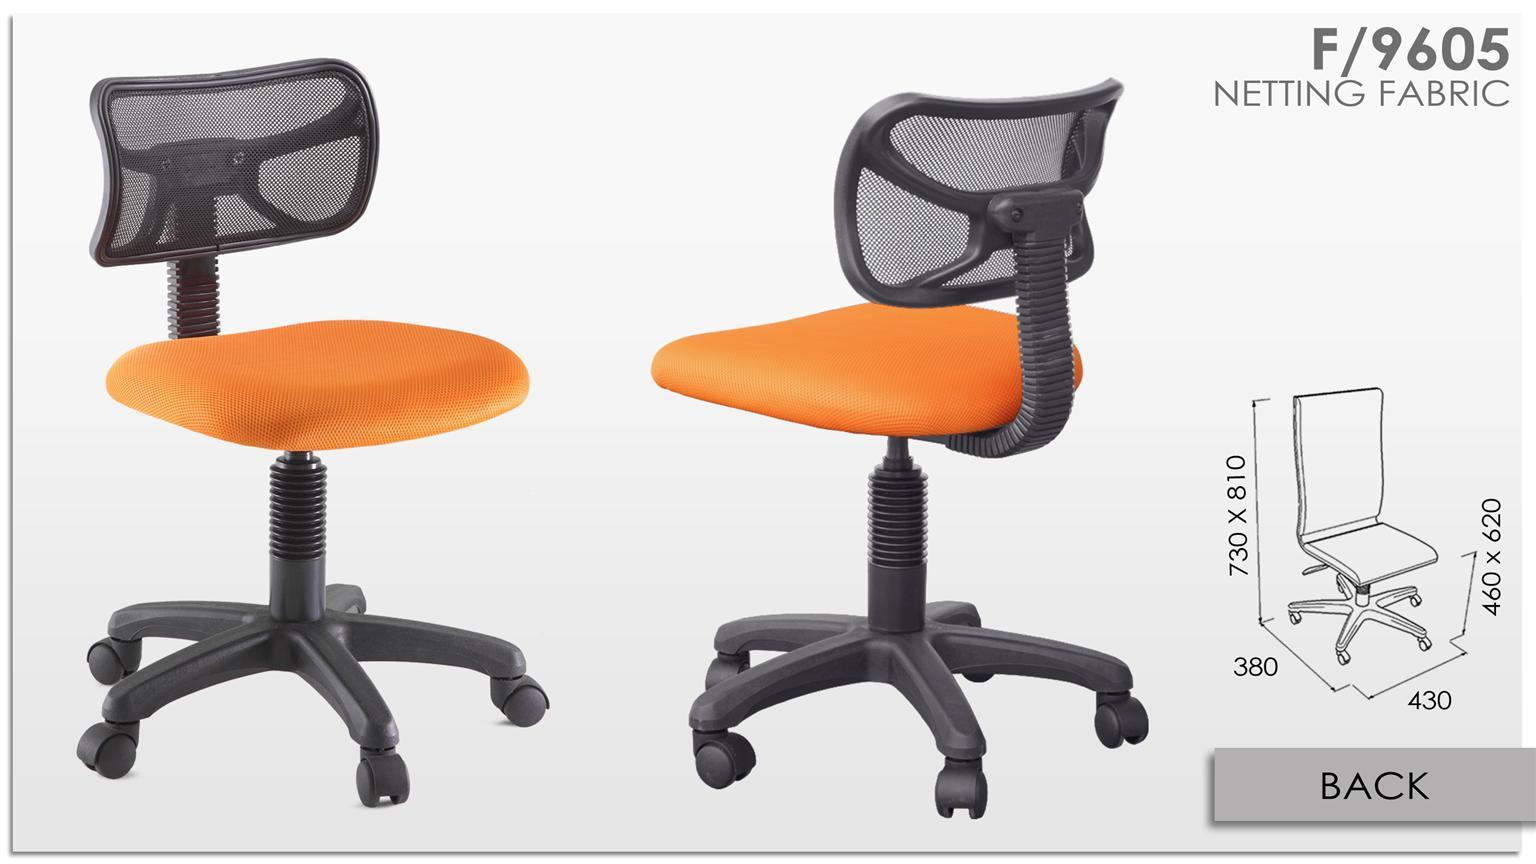 Ergonomic Office Typist Low Back Chai End 1 6 2020 3 15 Pm